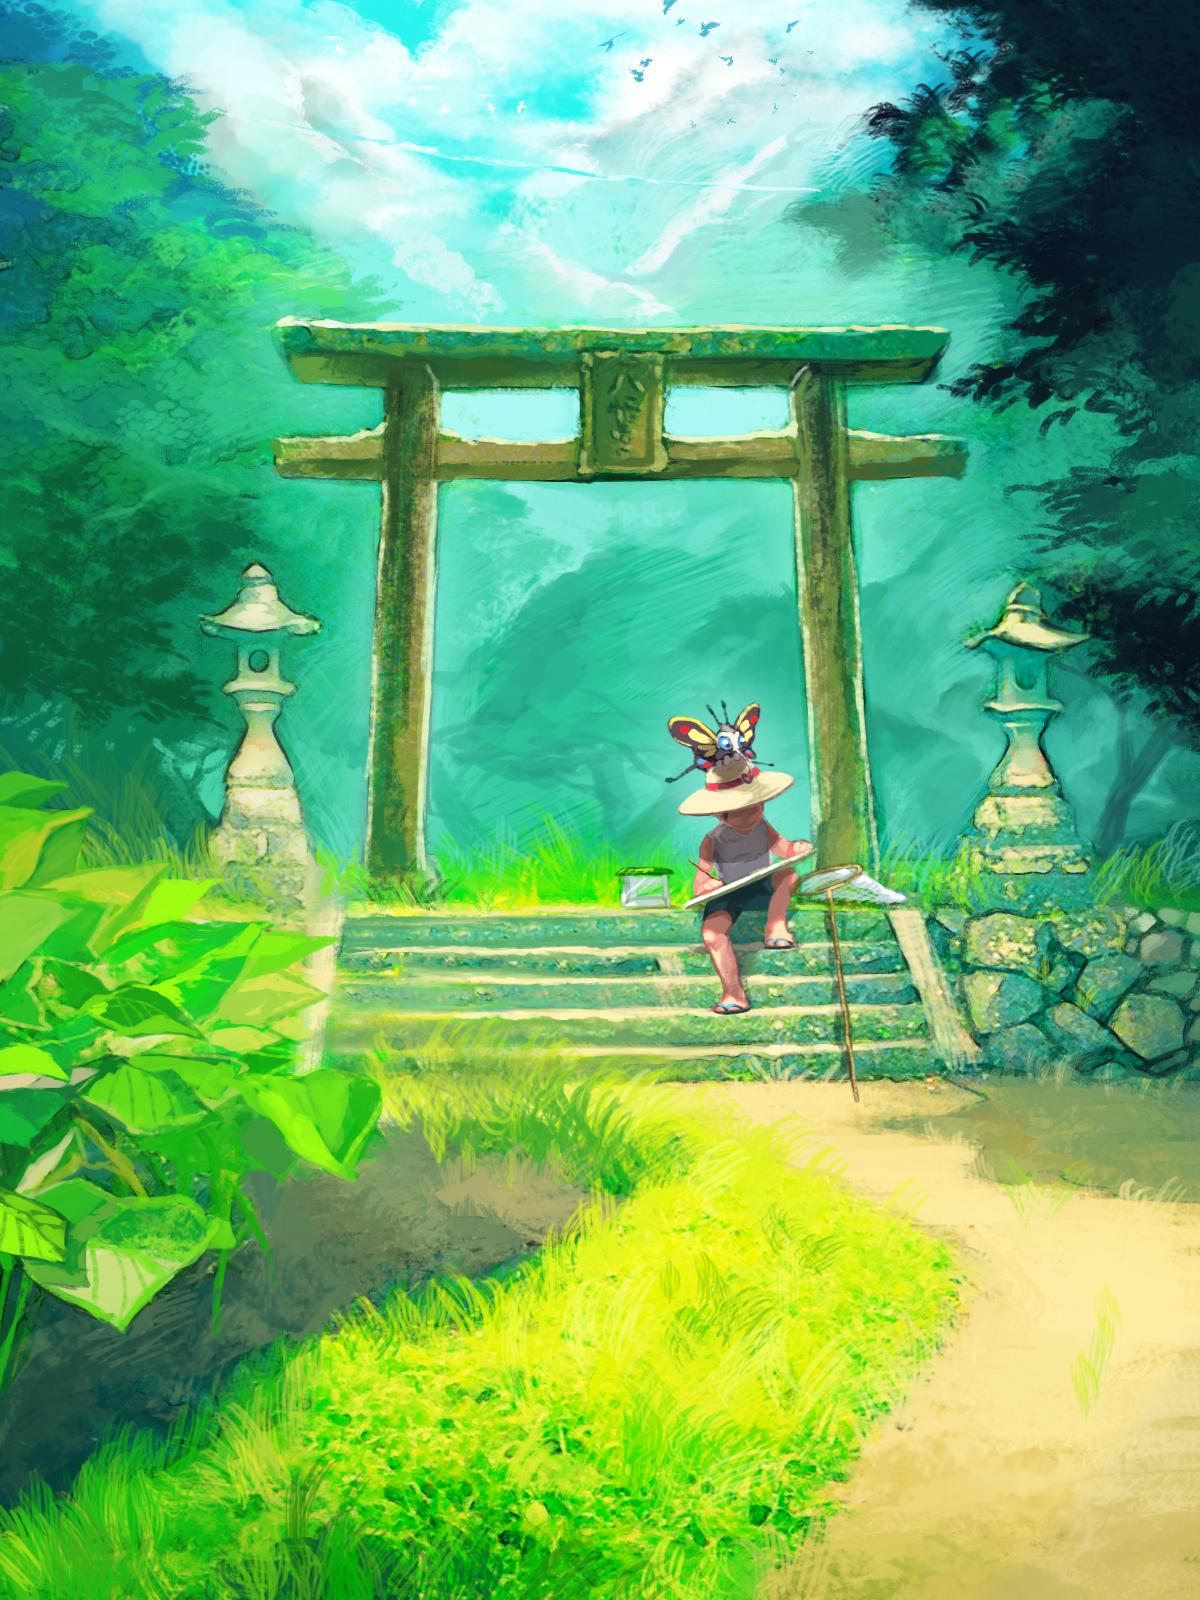 Amazing Wallpaper Mobile Pokemon - Pok%C3%A9mon  Perfect Image Reference_557873.jpg